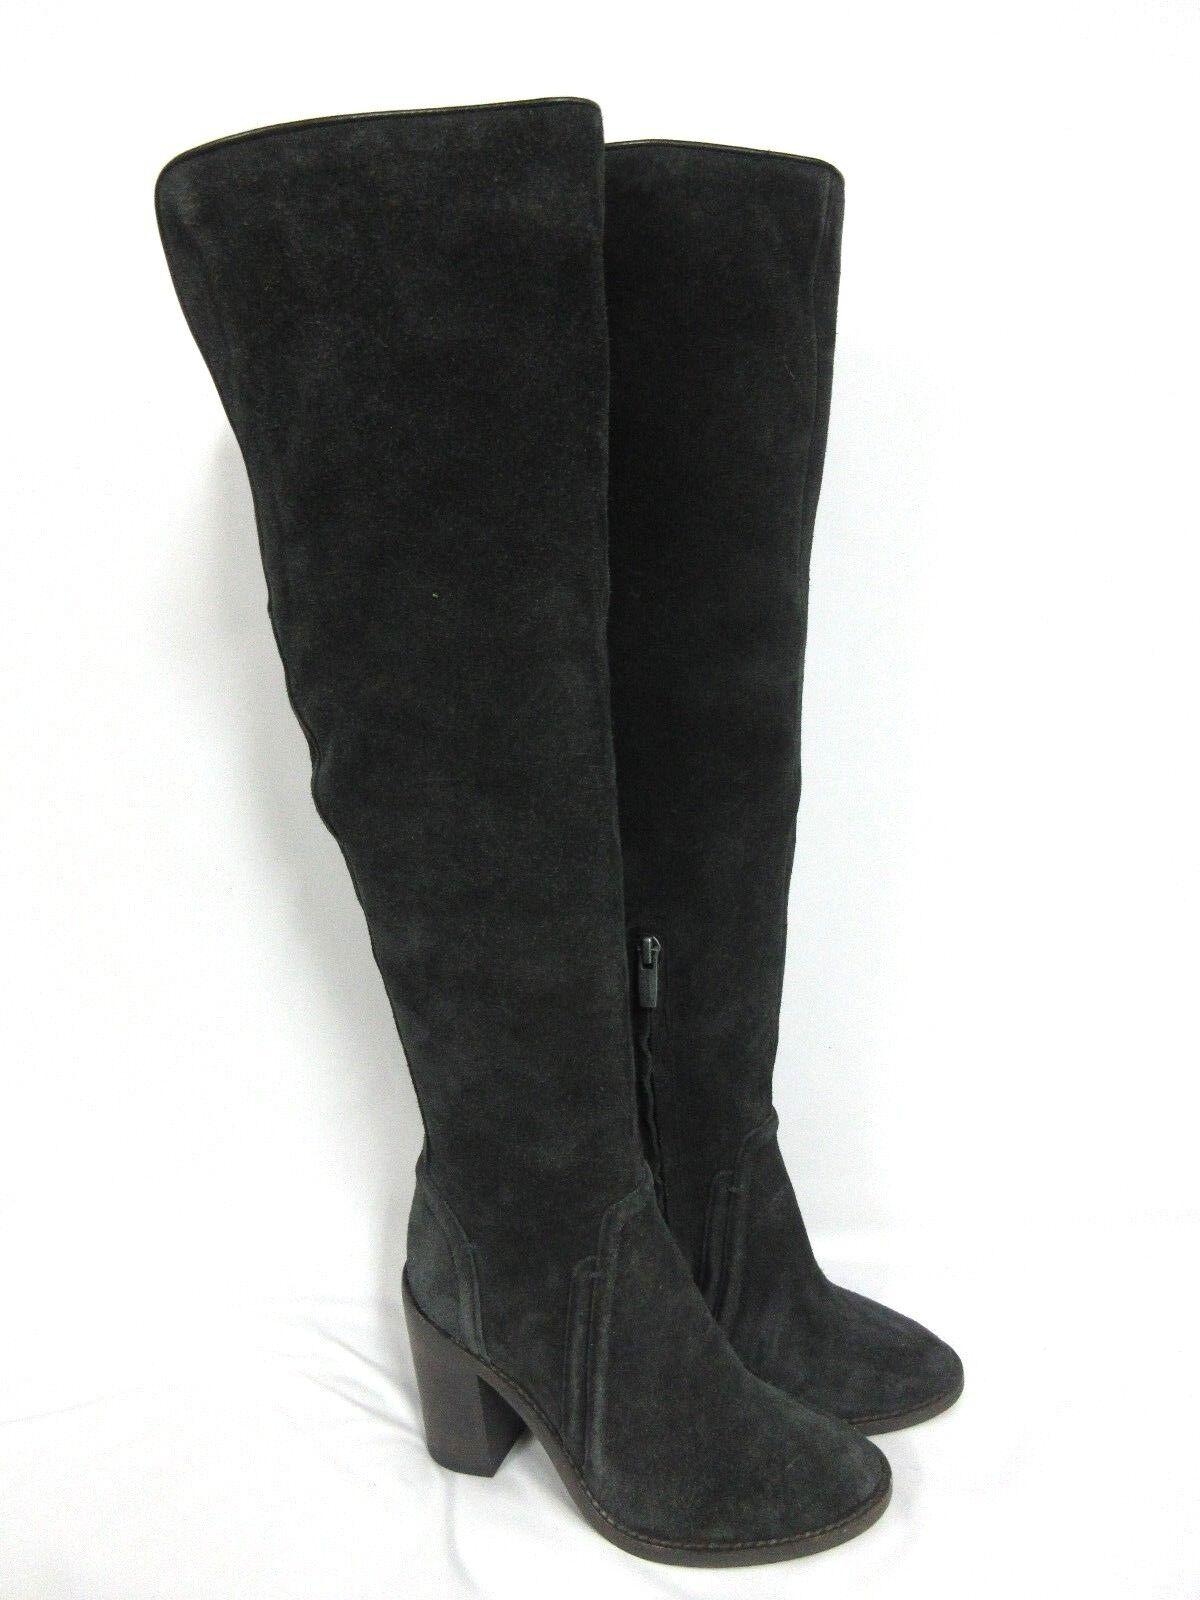 NEU Vince Camuto Melaya Over The Knee Suede Gray Stiefel  Größe: 5.5